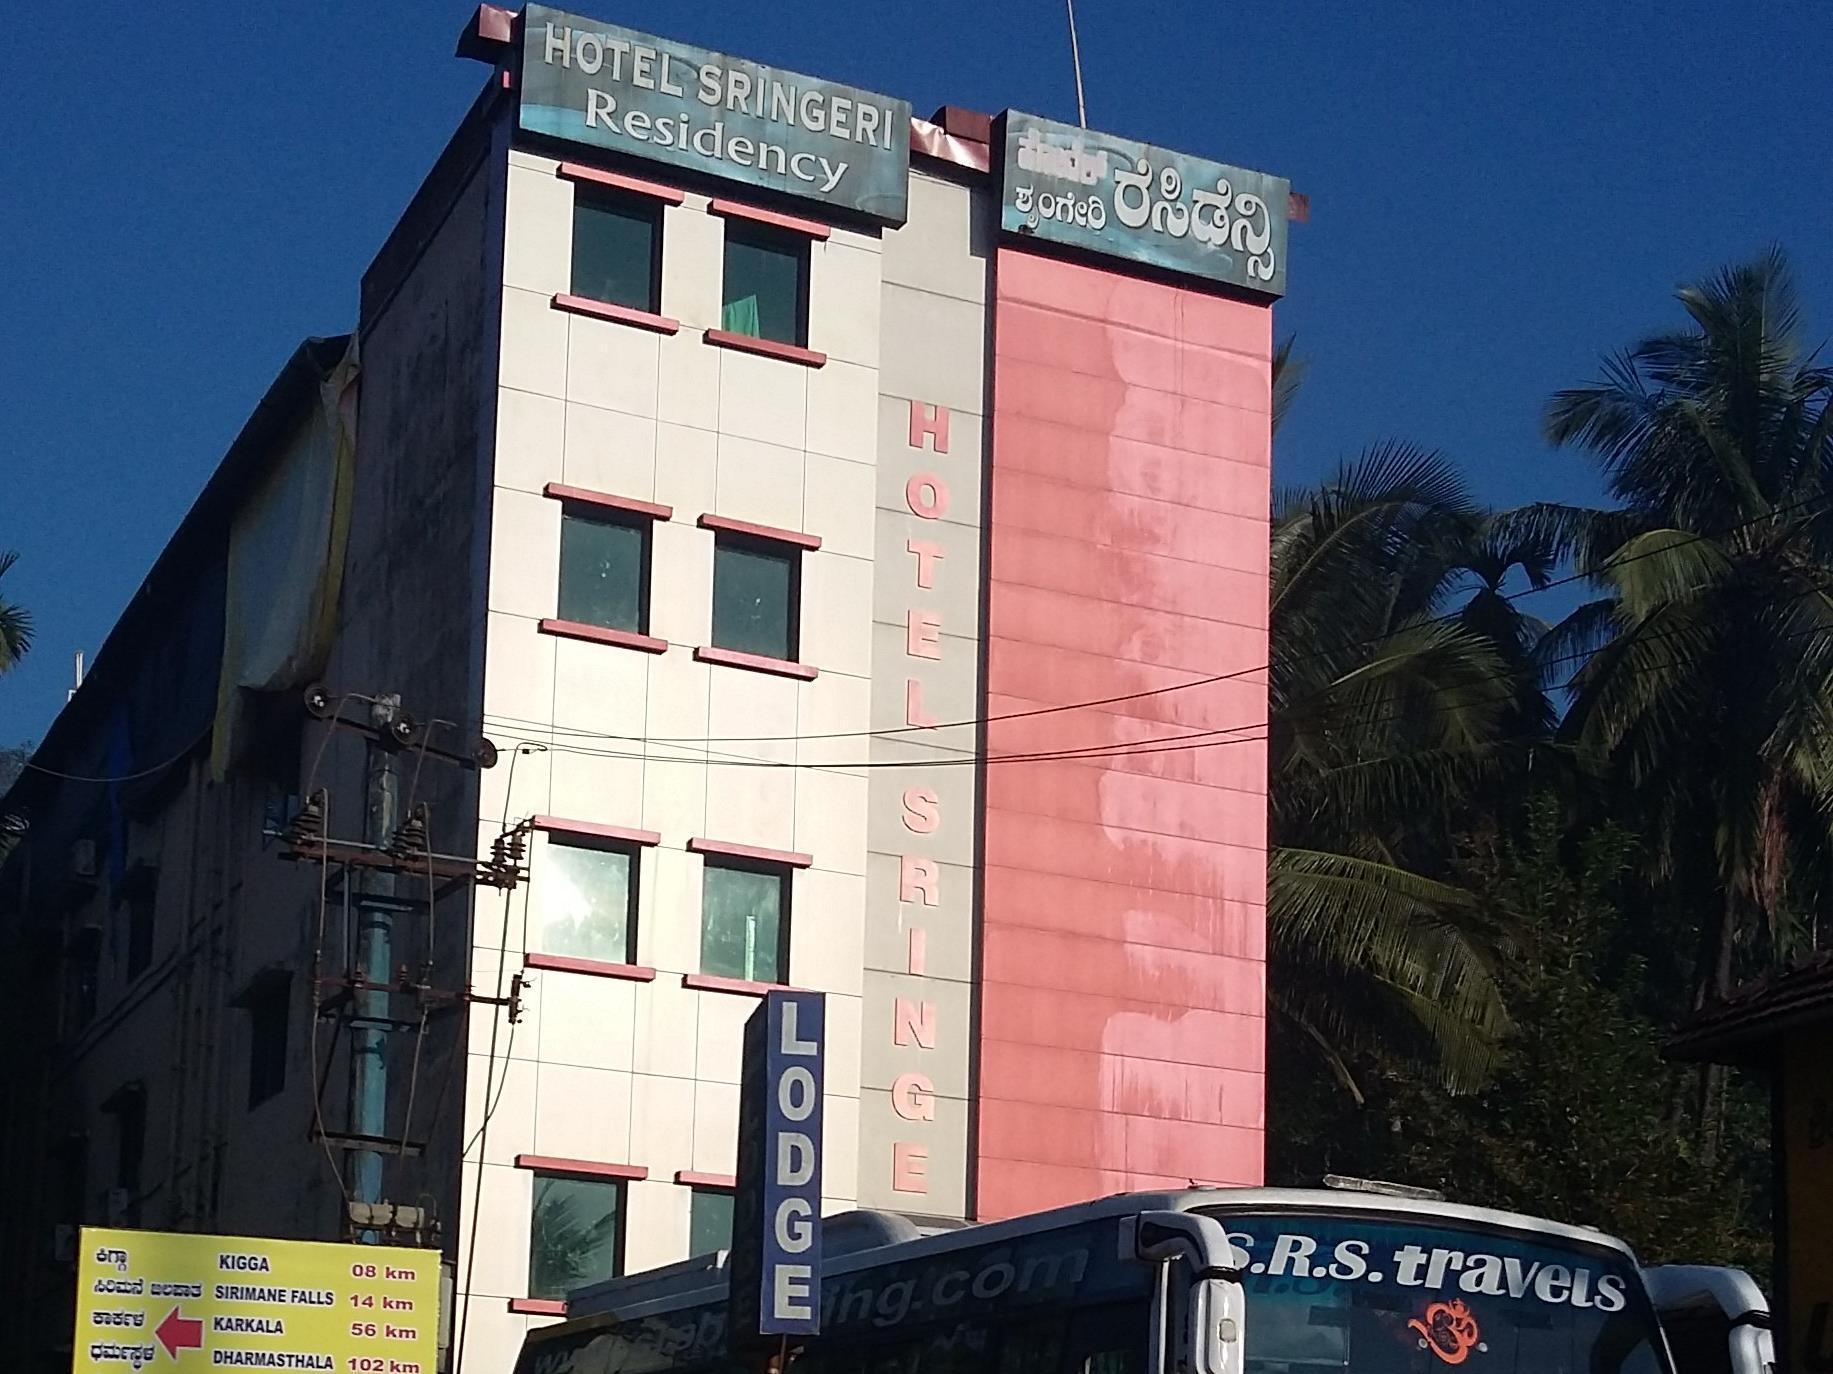 Hotel Prime Residency Hotel Sringeri Residency Top Hotels